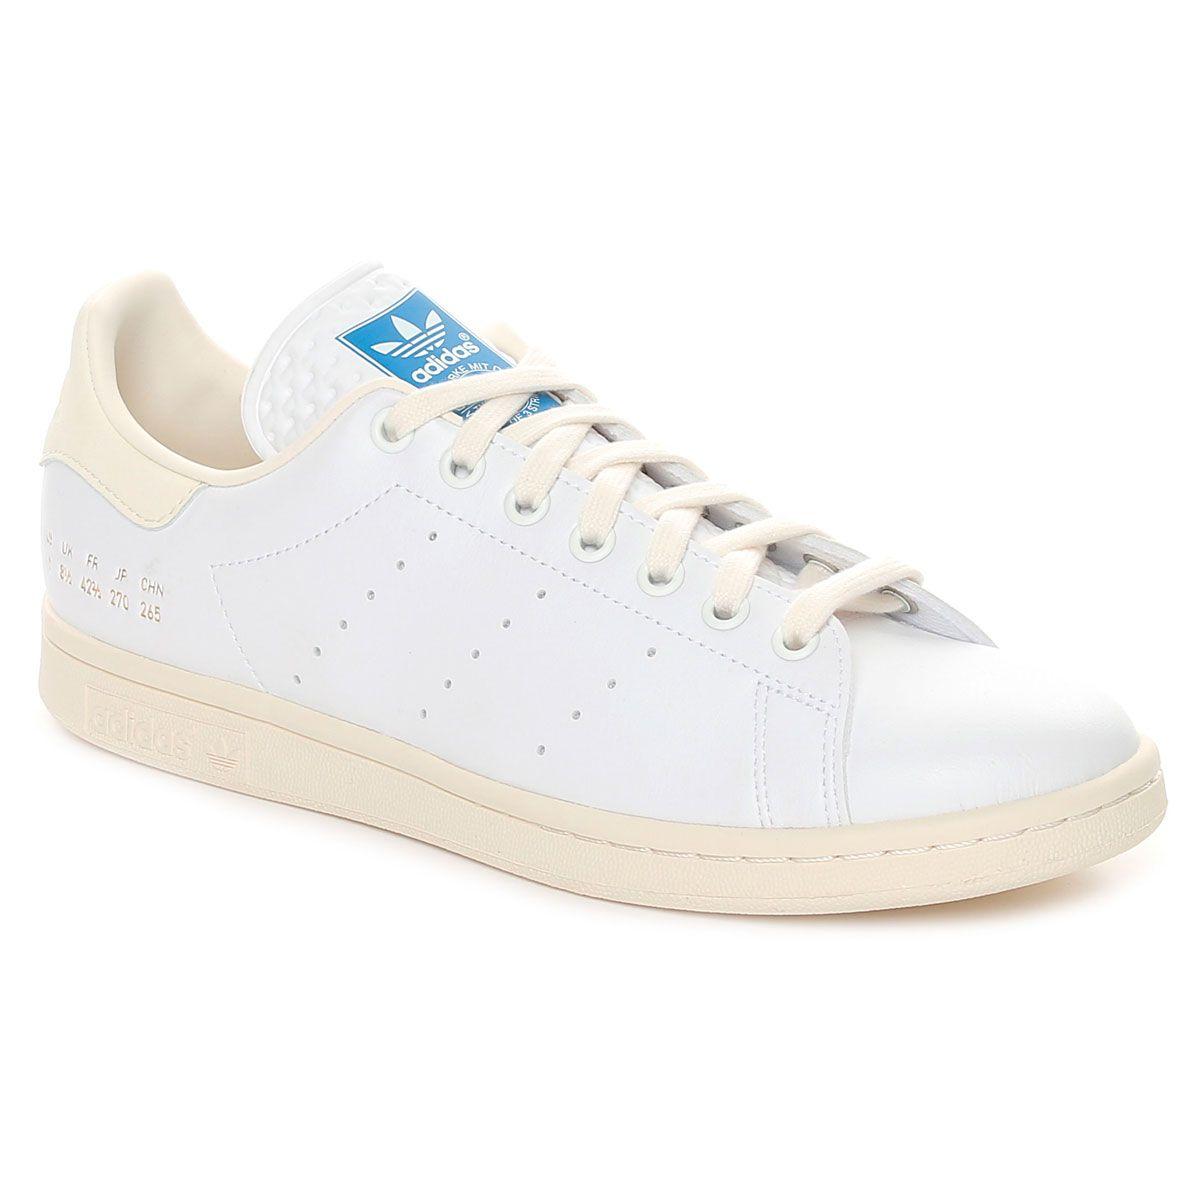 adidas Stan Smith Cream Uomo Bianco Crema